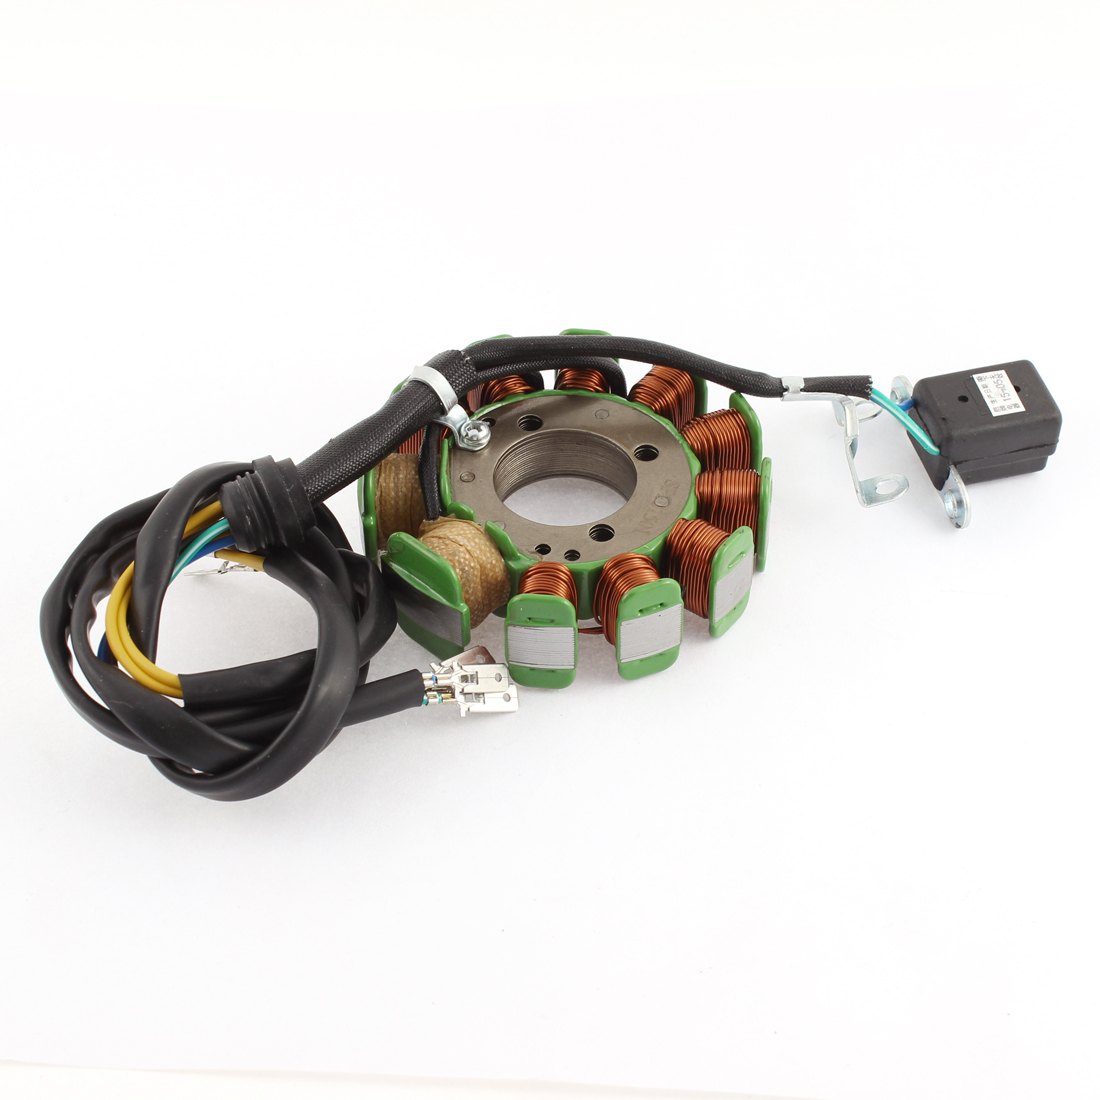 Motorbike Magneto Engine Stator Generator Charging Coil 4A 35W CG125-11